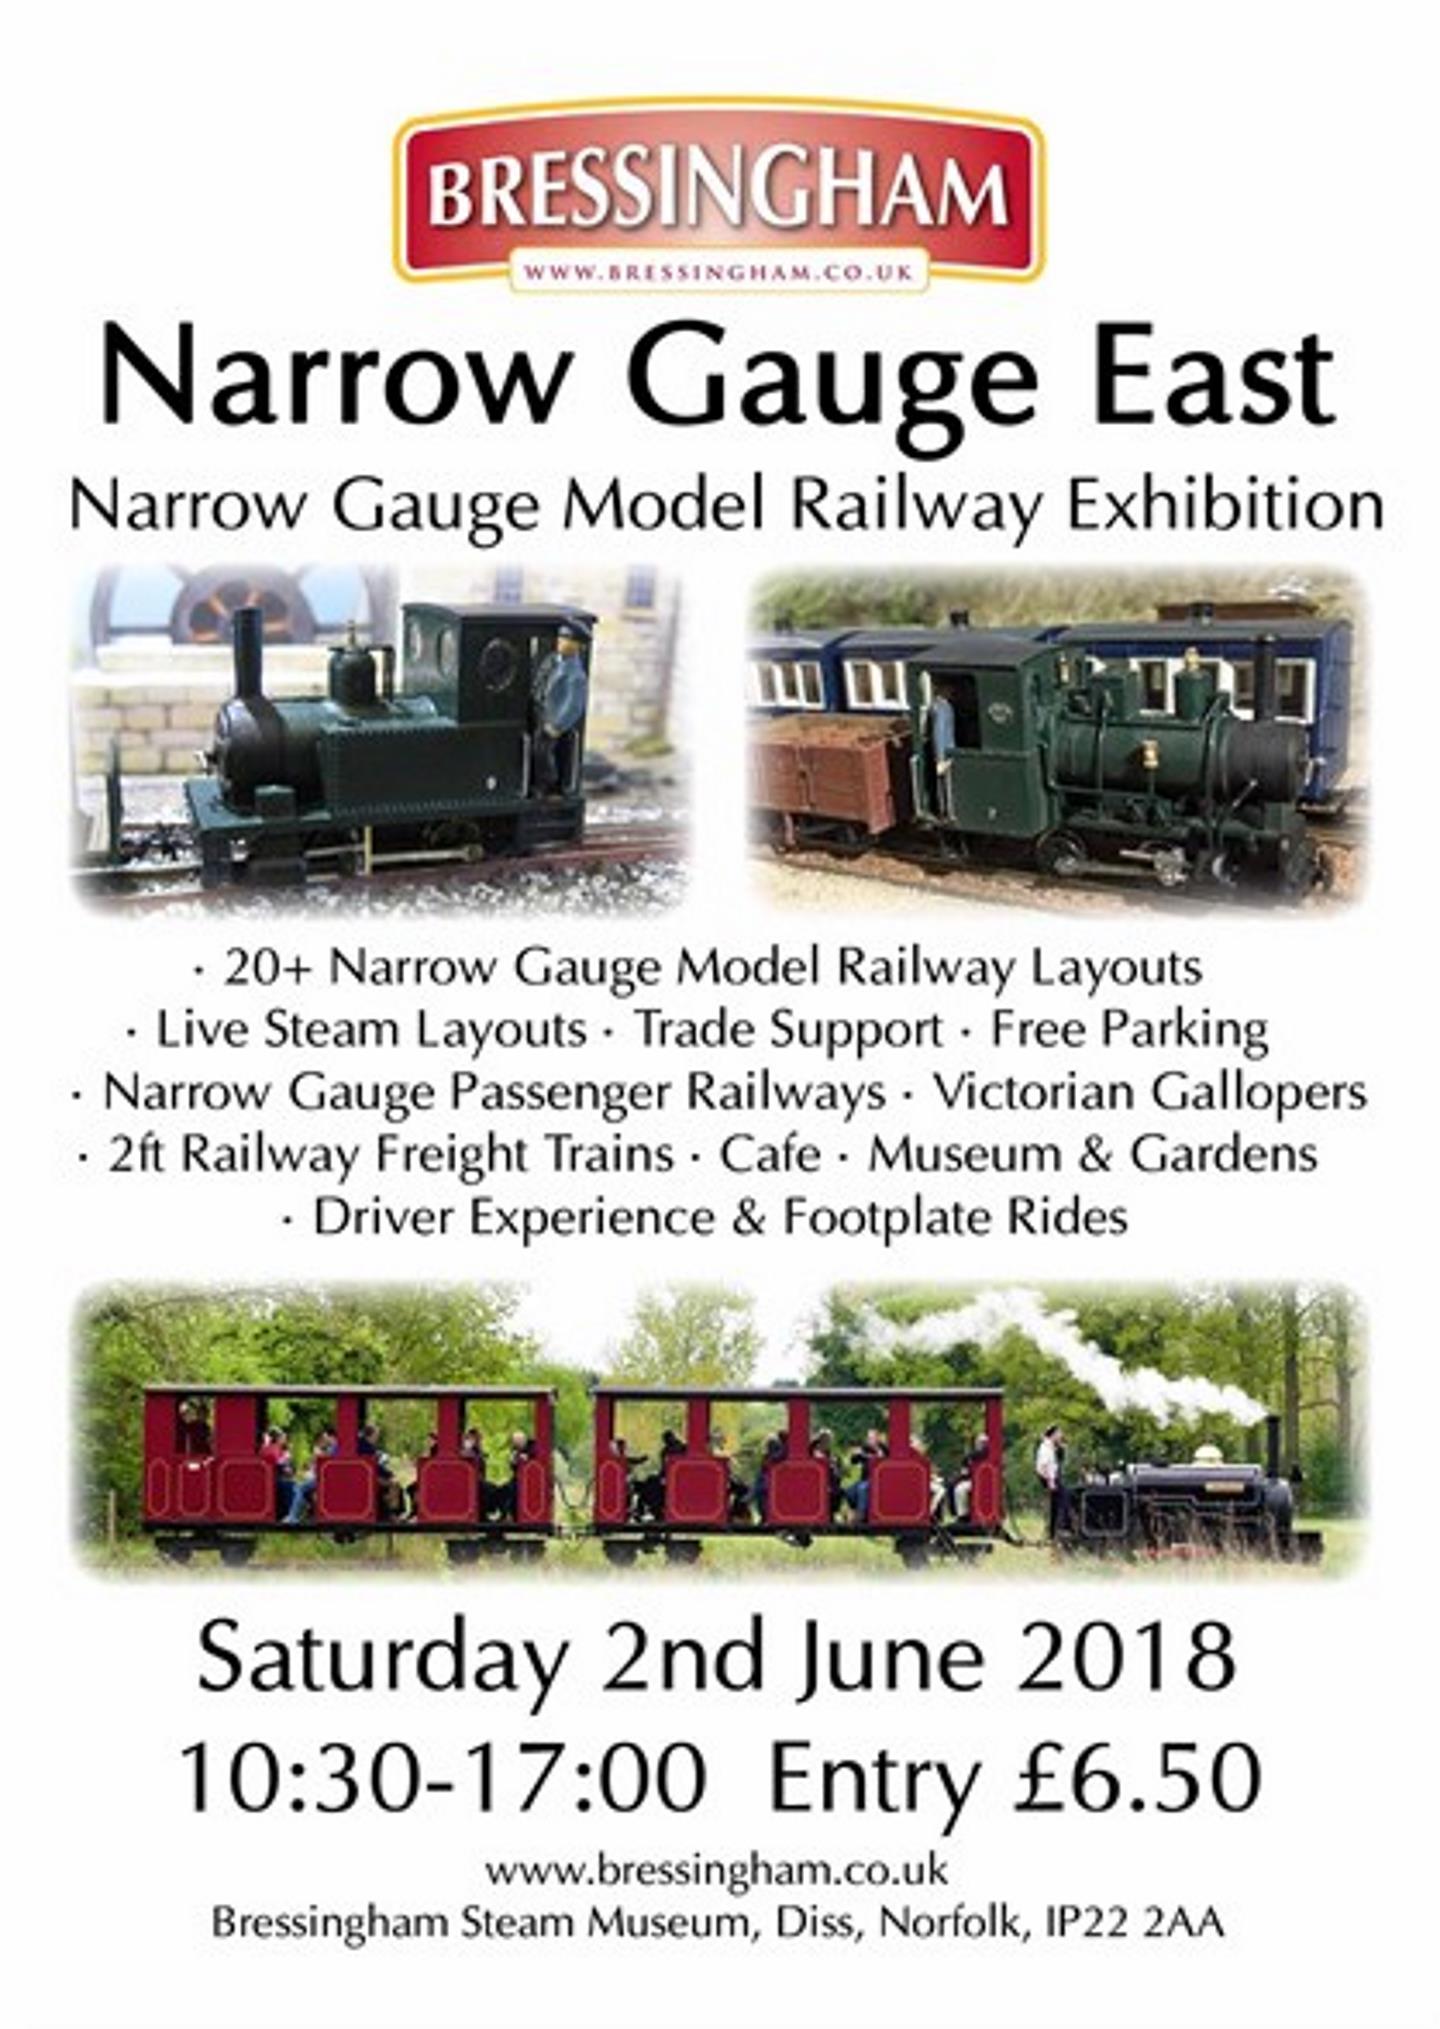 Narrow Gauge East (Model Rail Exhibition) - Bressingham